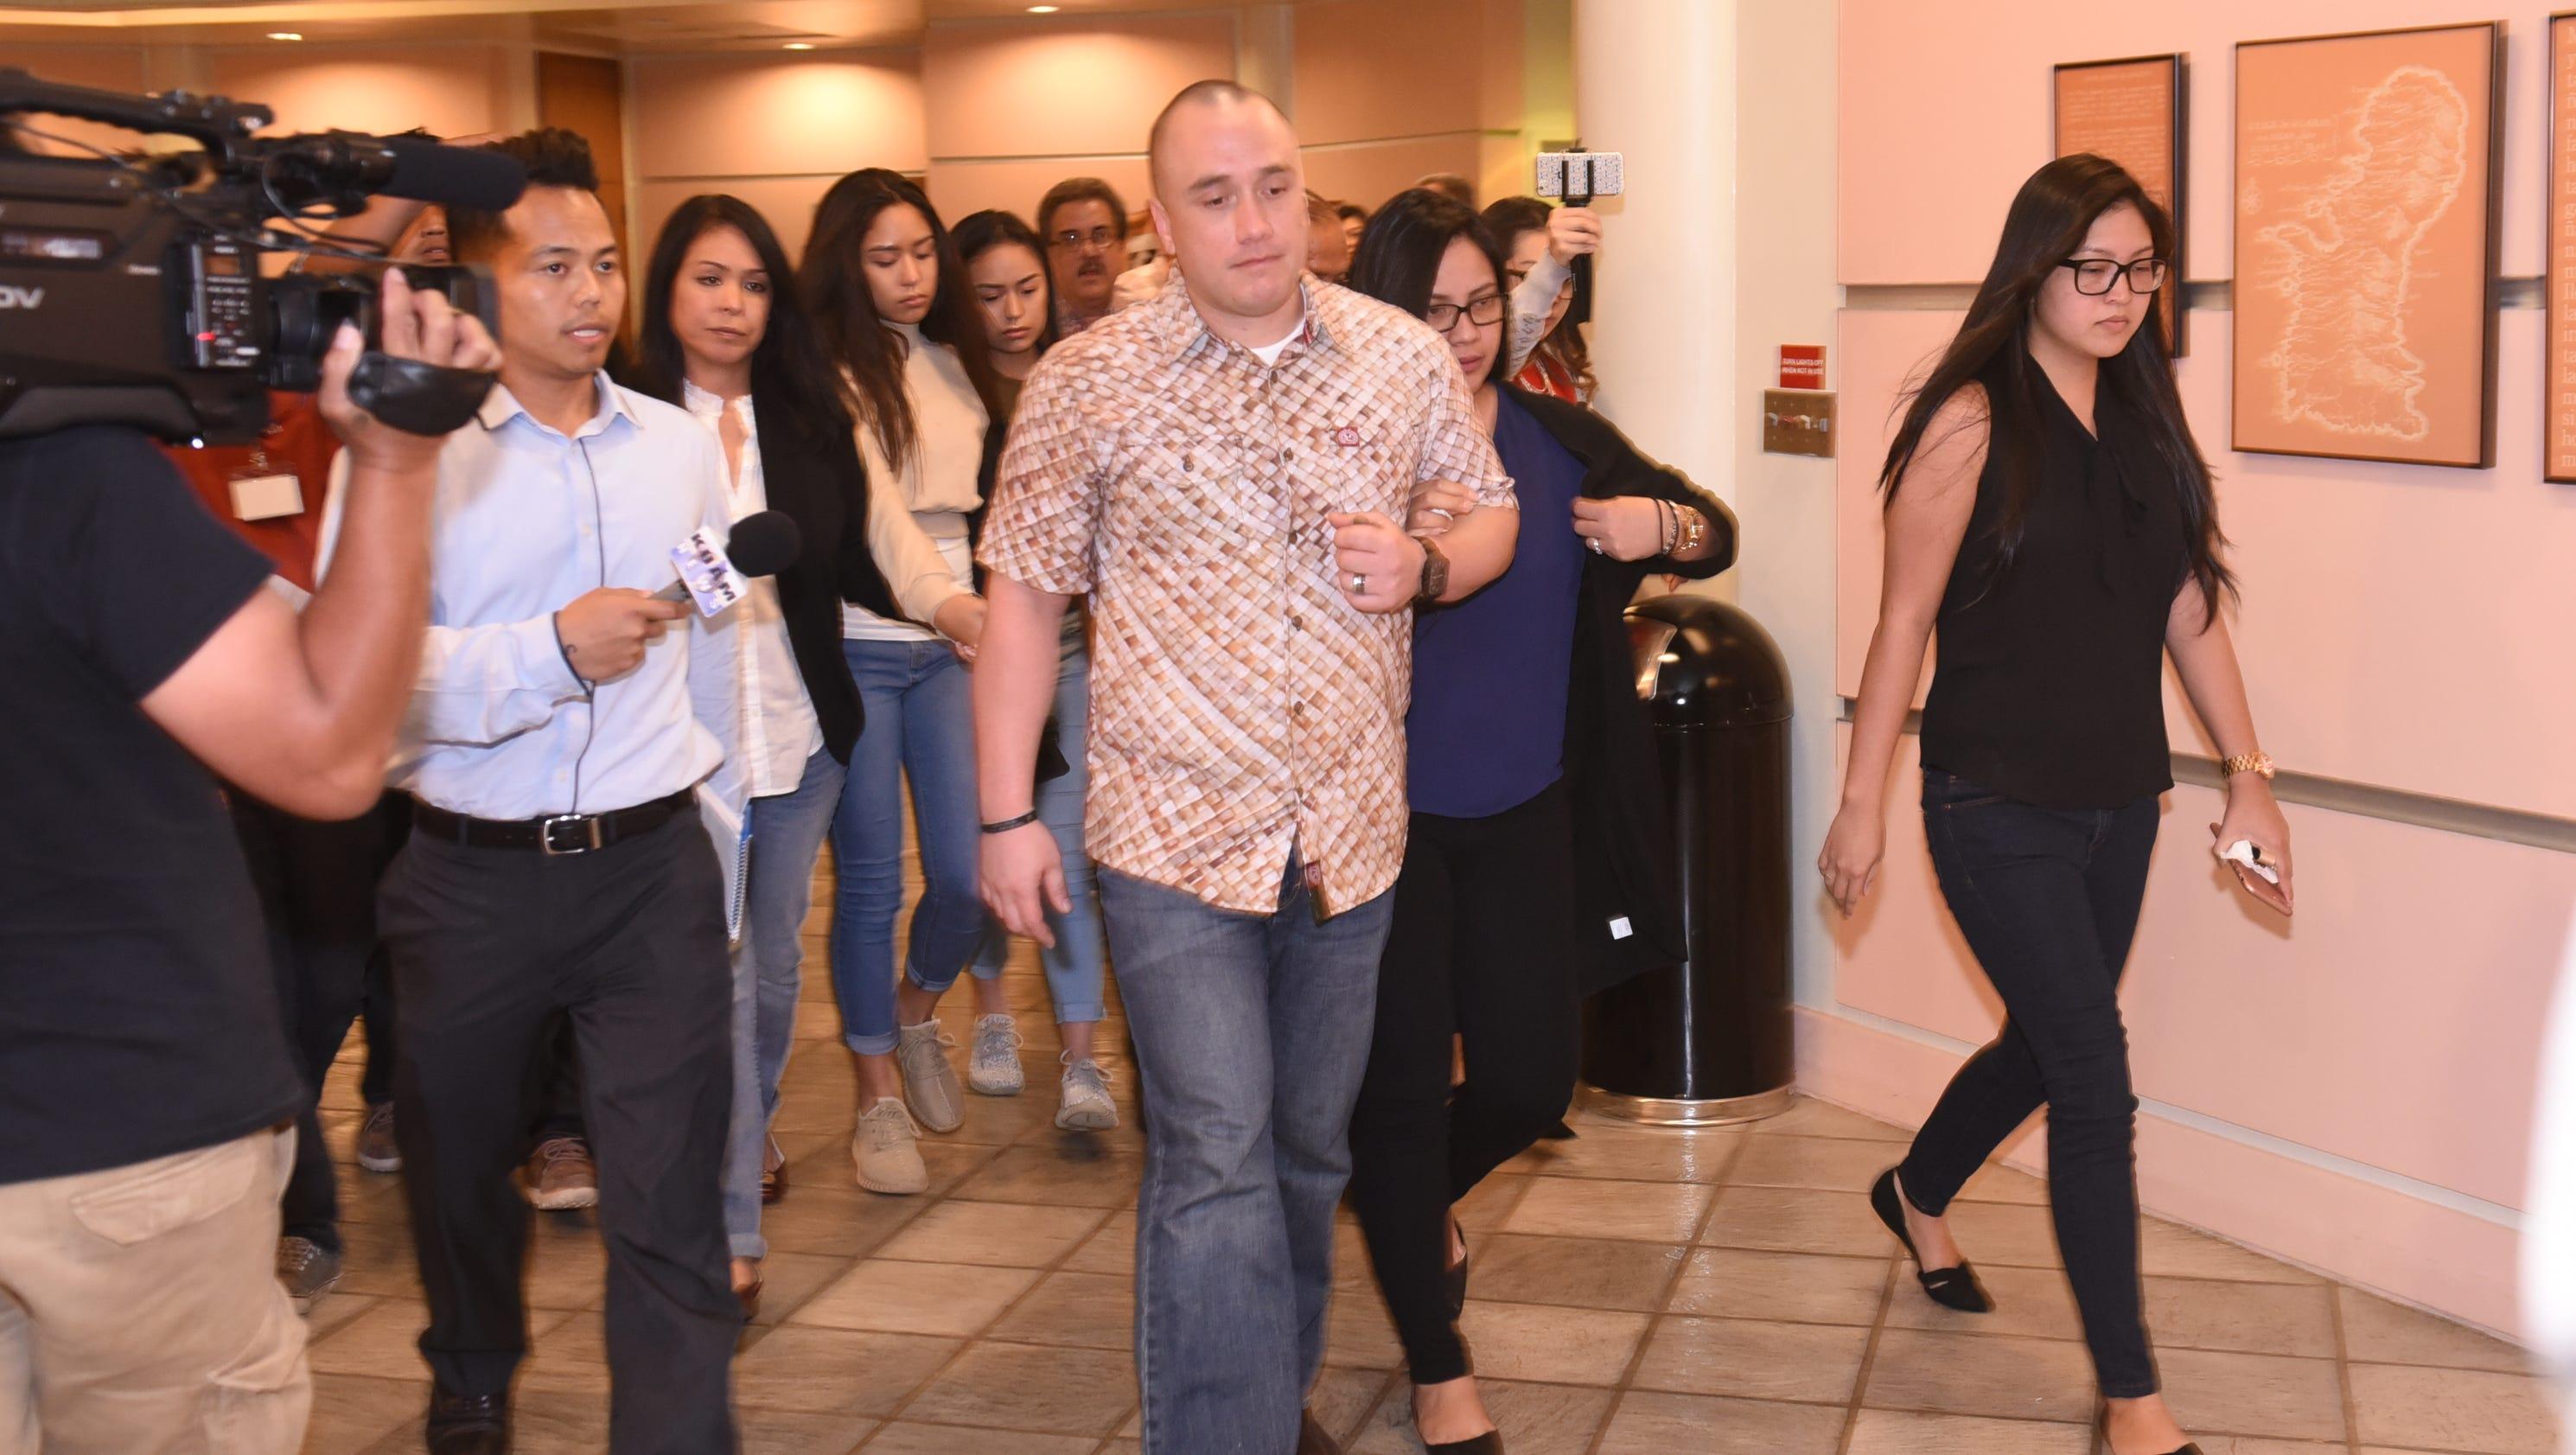 Guam ex-cop awaits sentencing for killing fellow officer